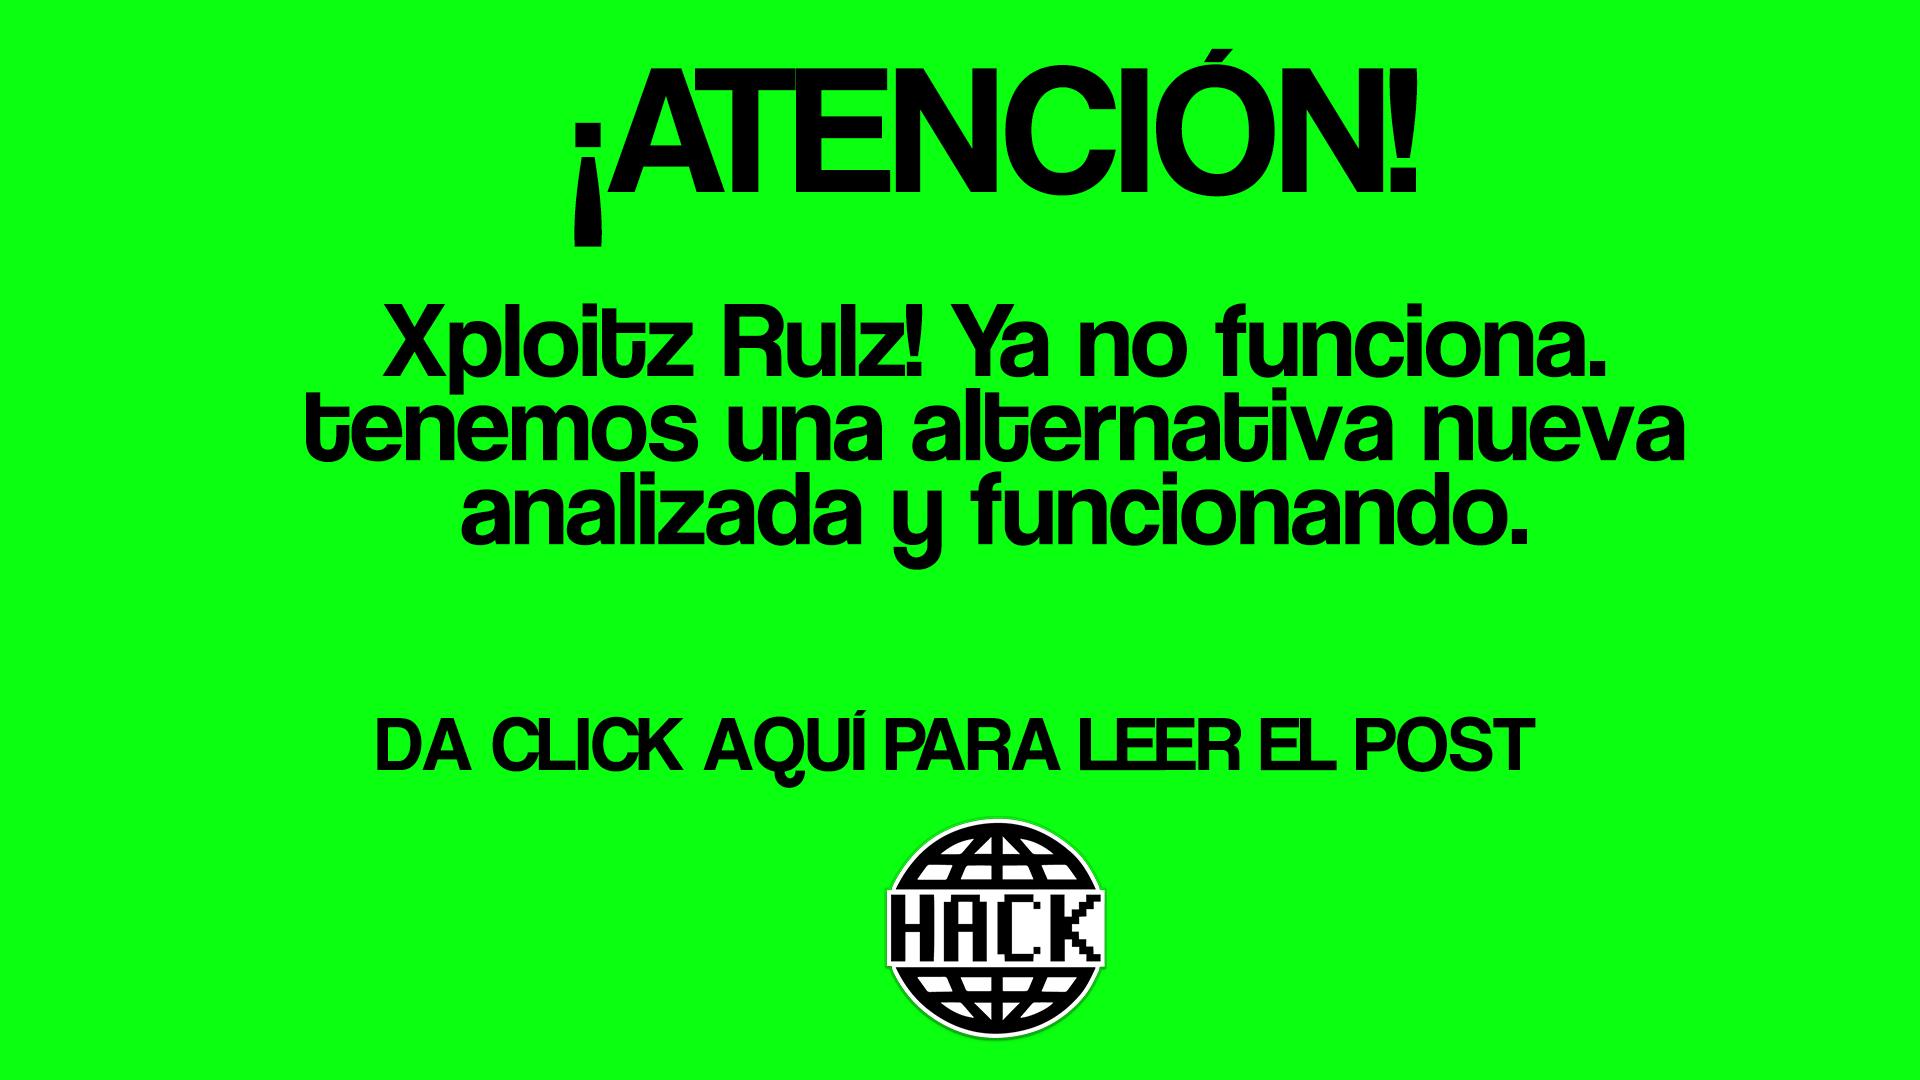 http://www.blogginred.com/2019/02/hackear-cuenta-facebook-con-bliser.html